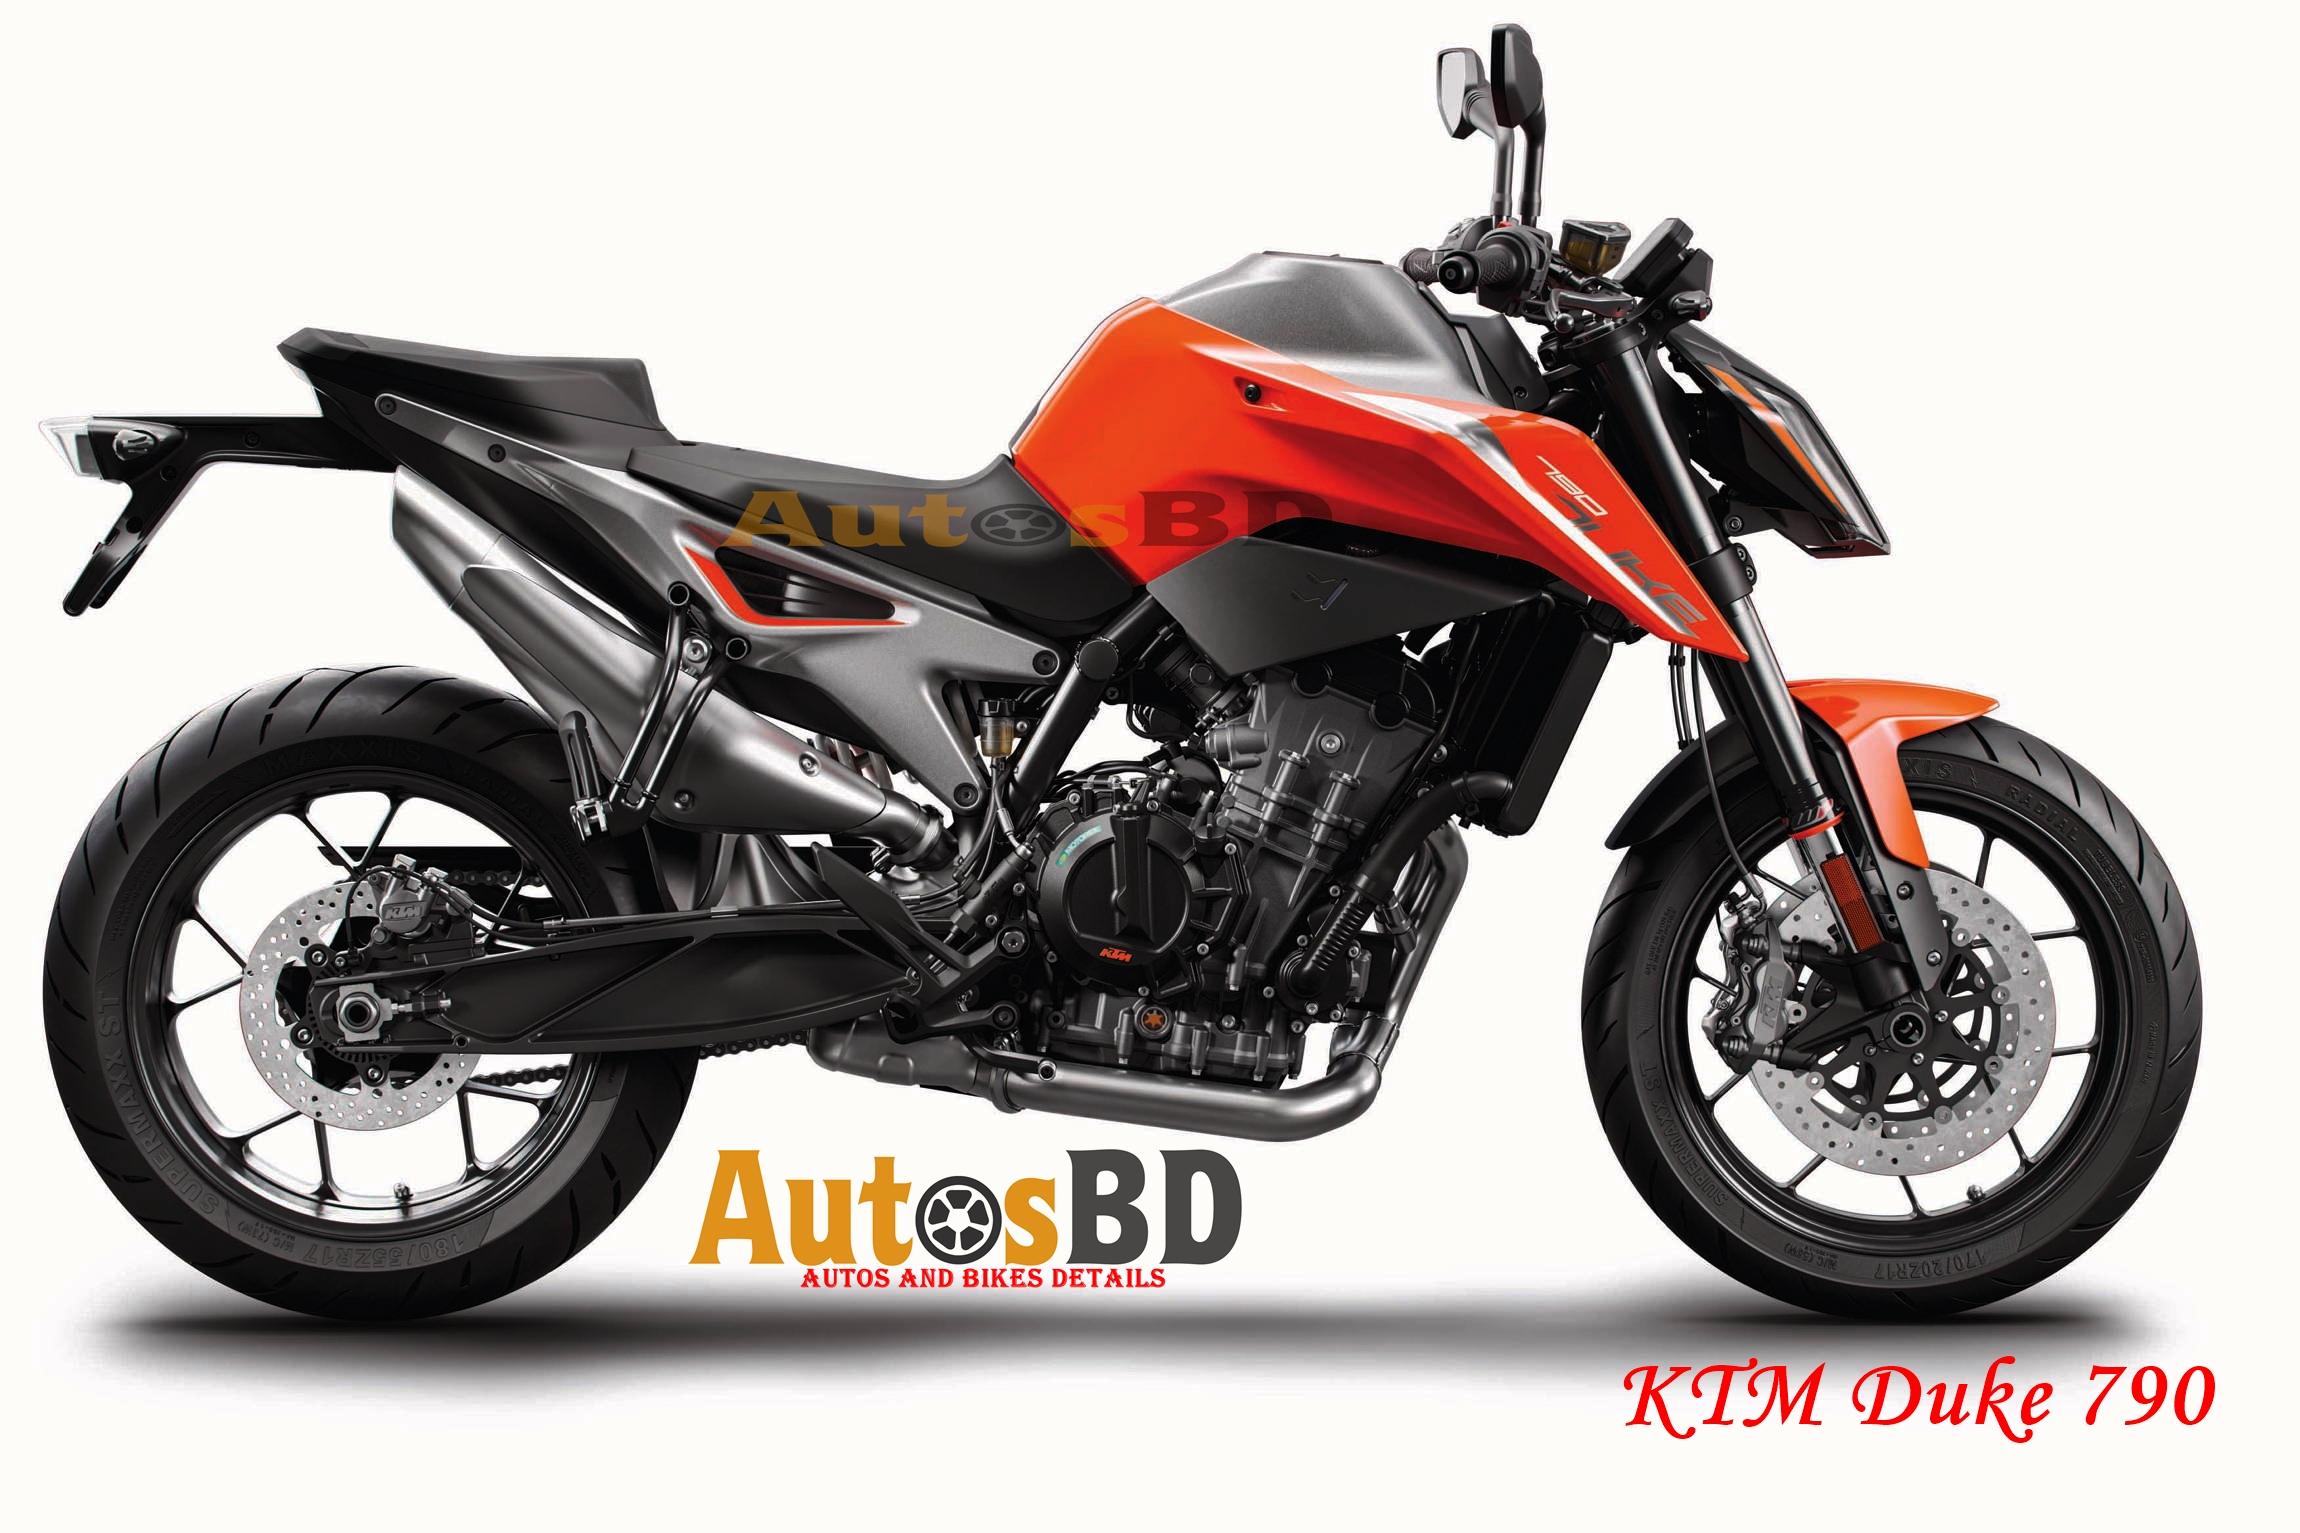 KTM Duke 790 Motorcycle Price in India